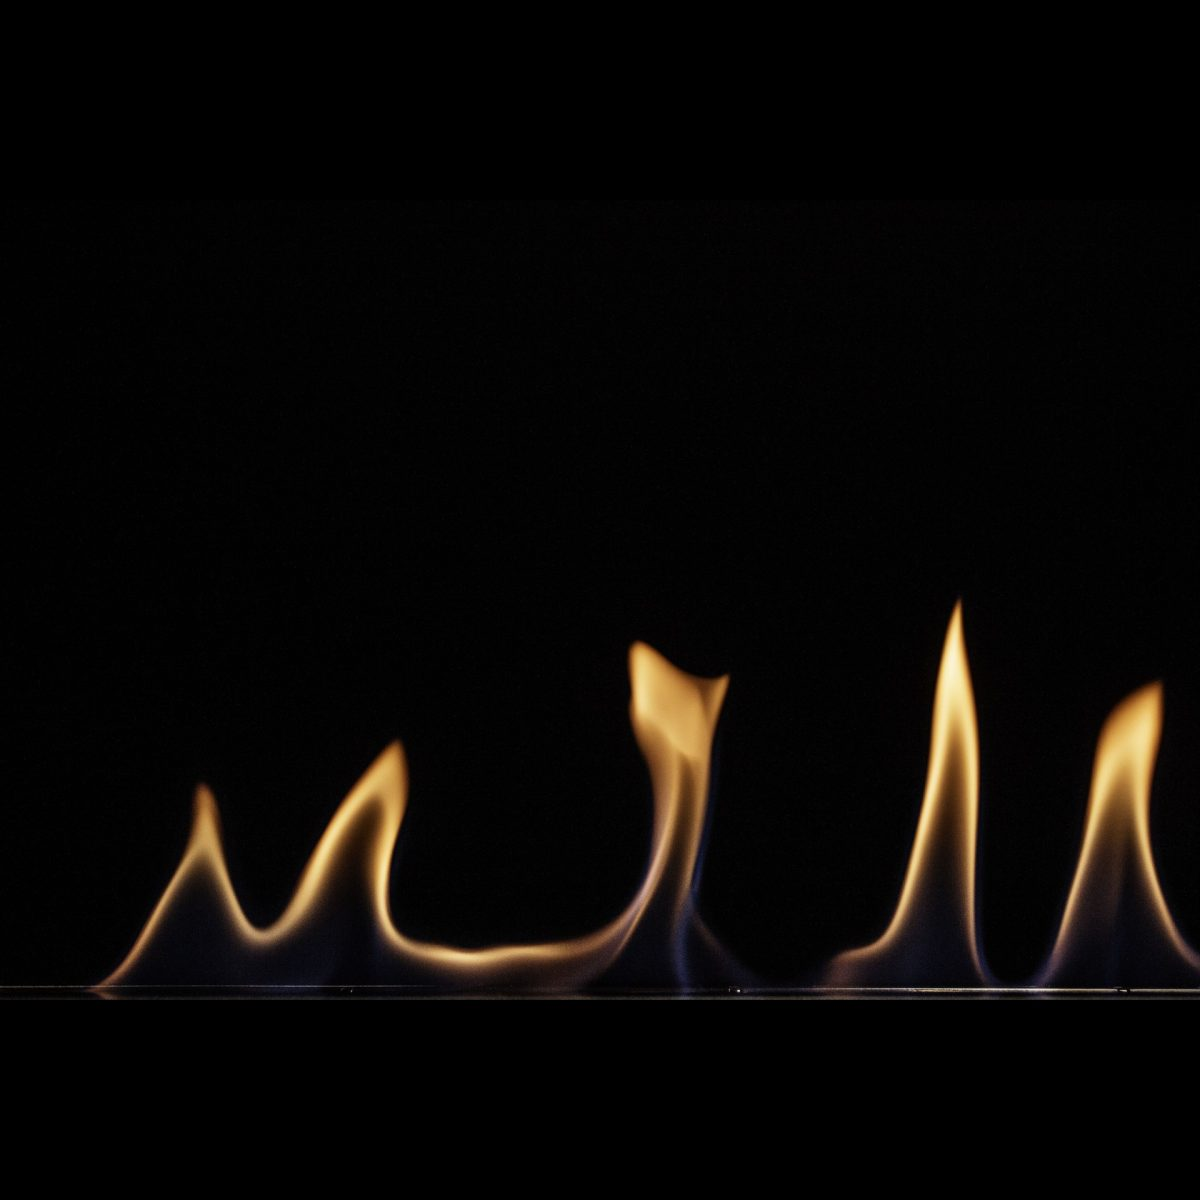 xglammfire_flame_evoplus_line_hd_002-1920×1920.jpg.pagespeed.ic.9LLGRDHQWI